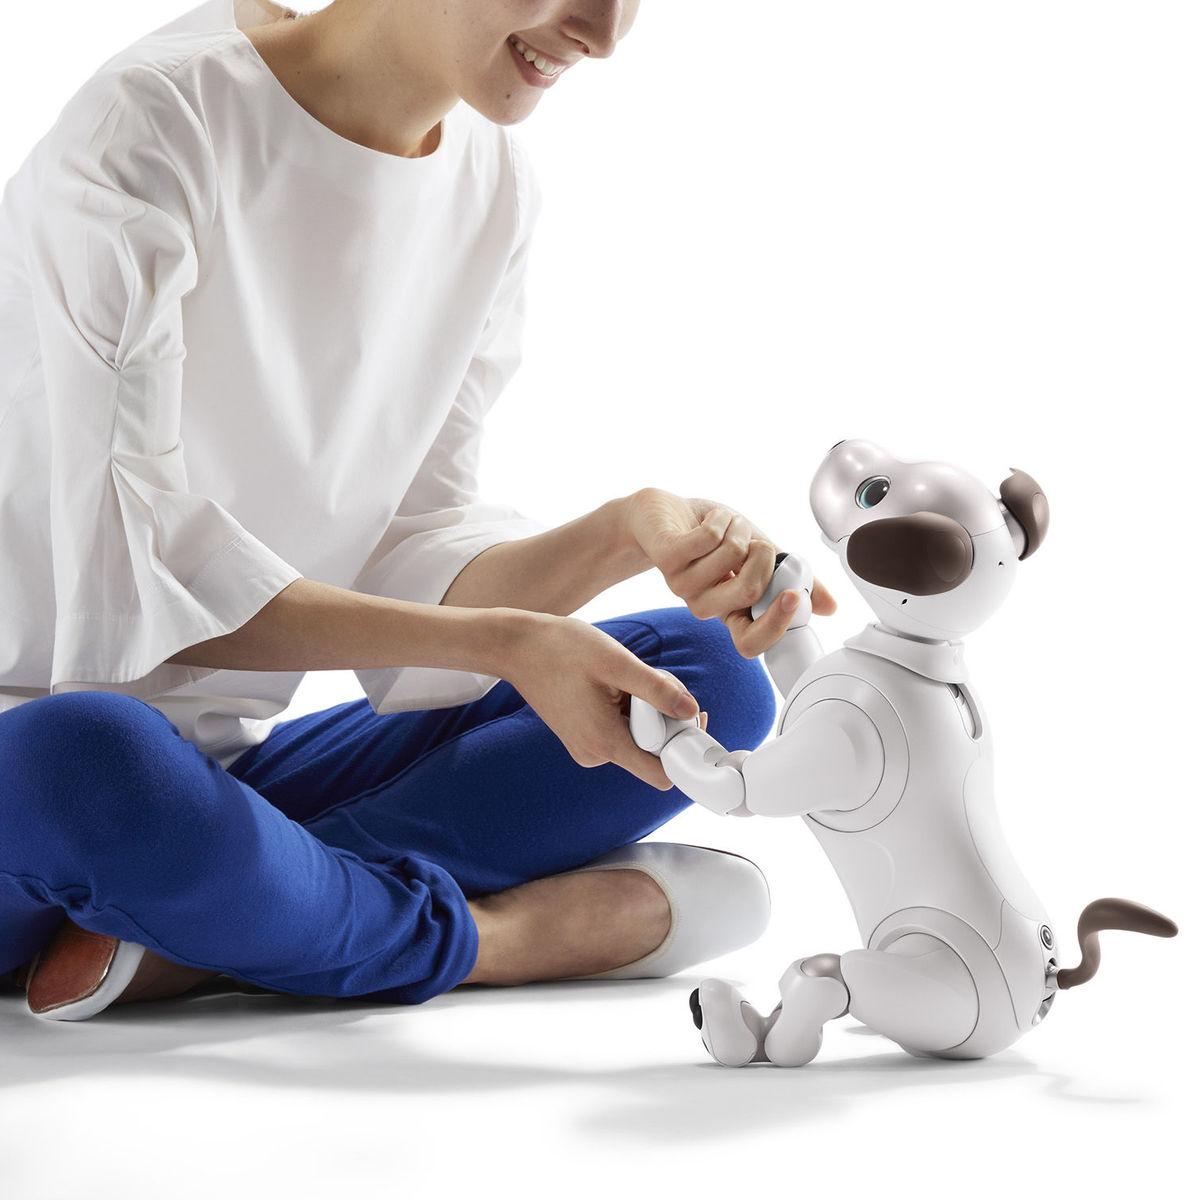 Sony aibo robot dog